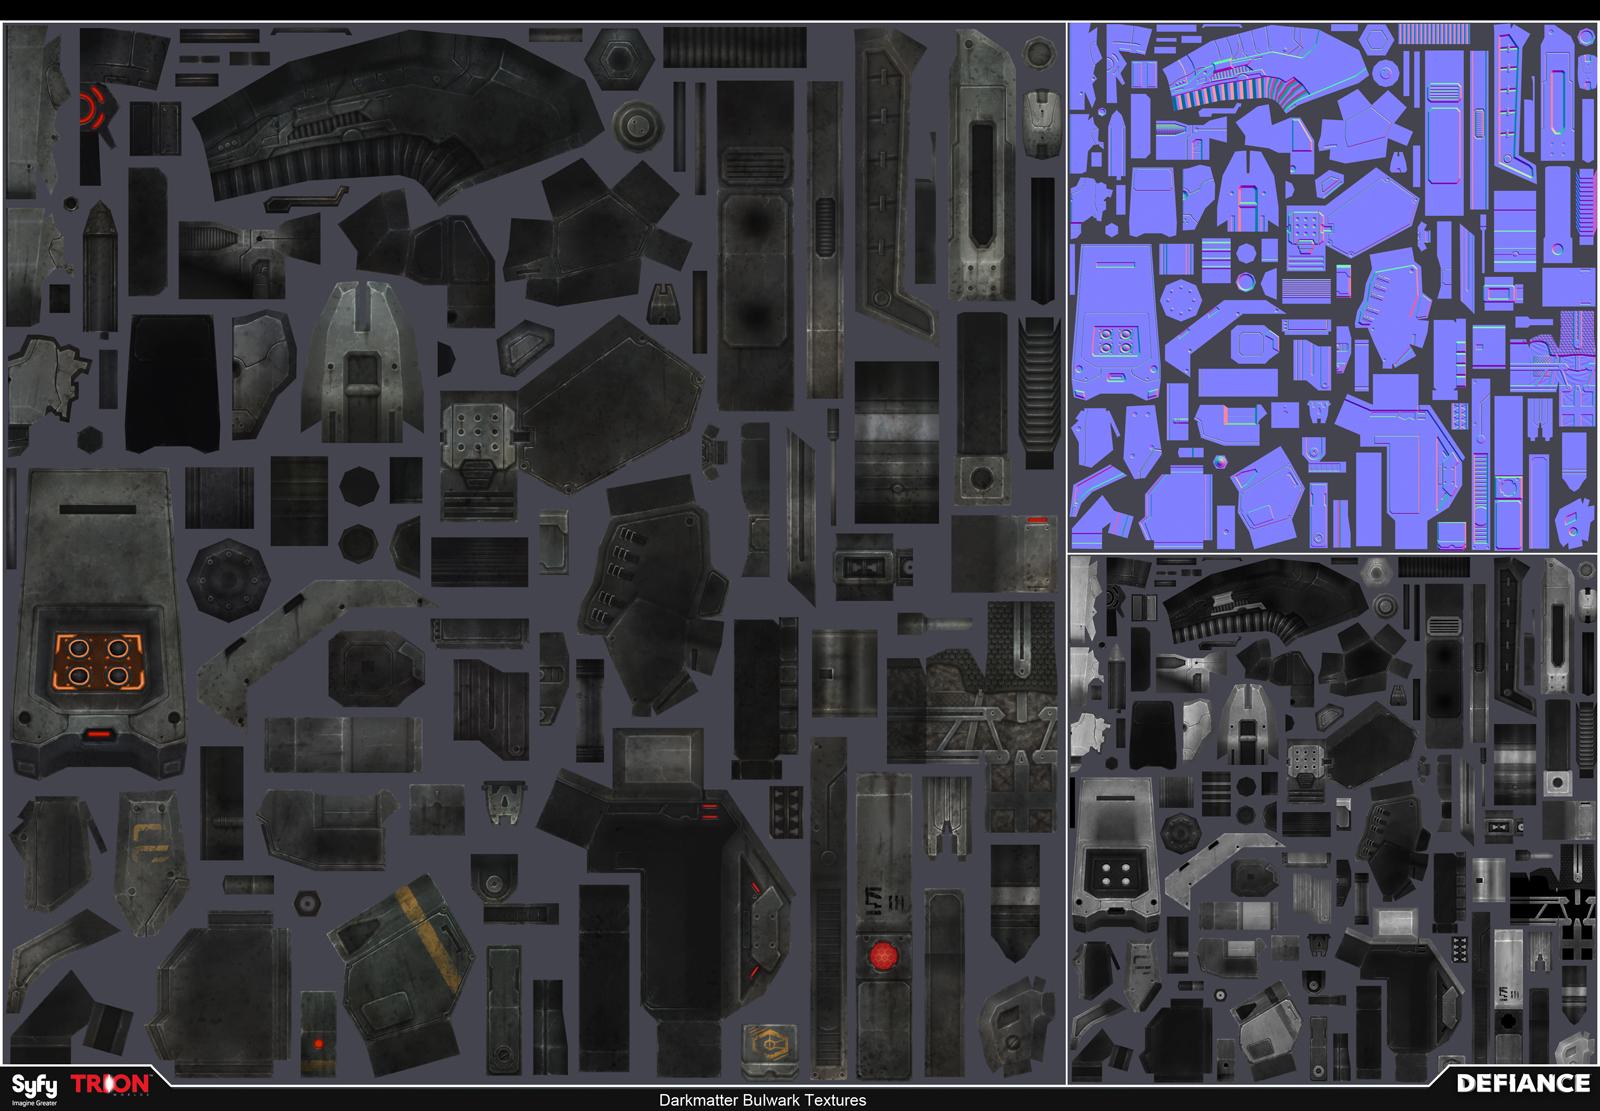 Npc darkmatter bulwark textures